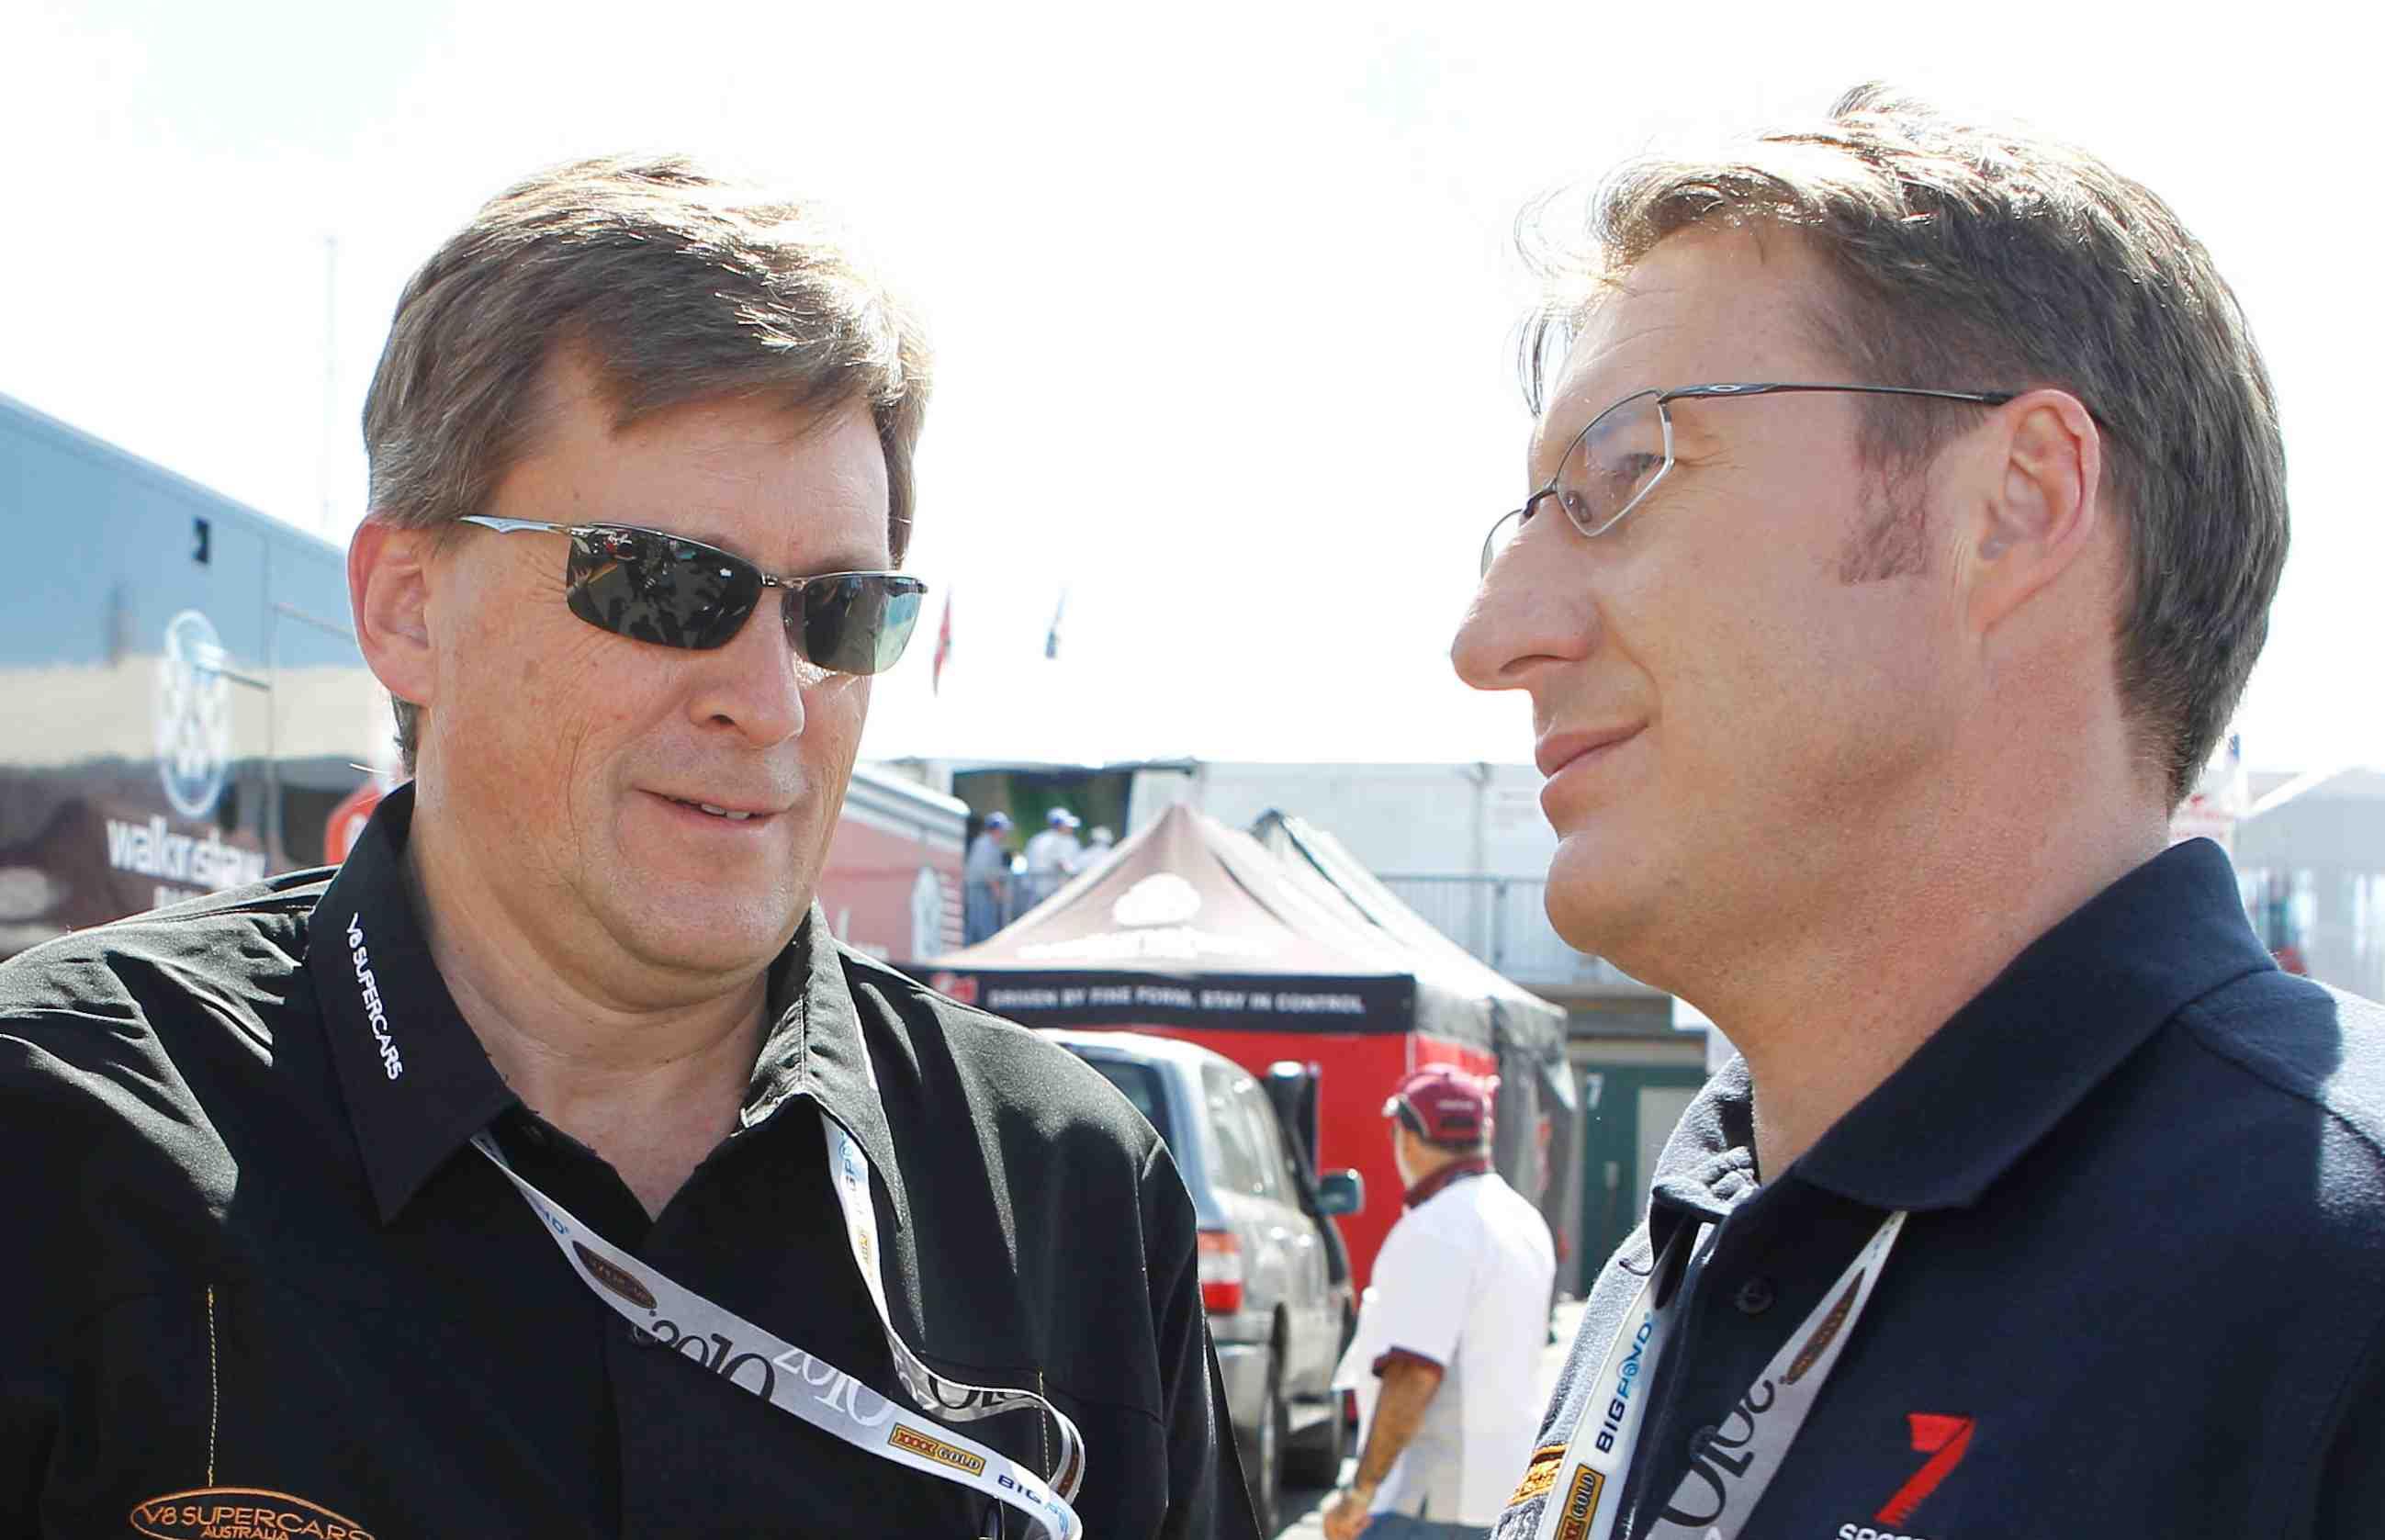 V8 Supercars announces new commission